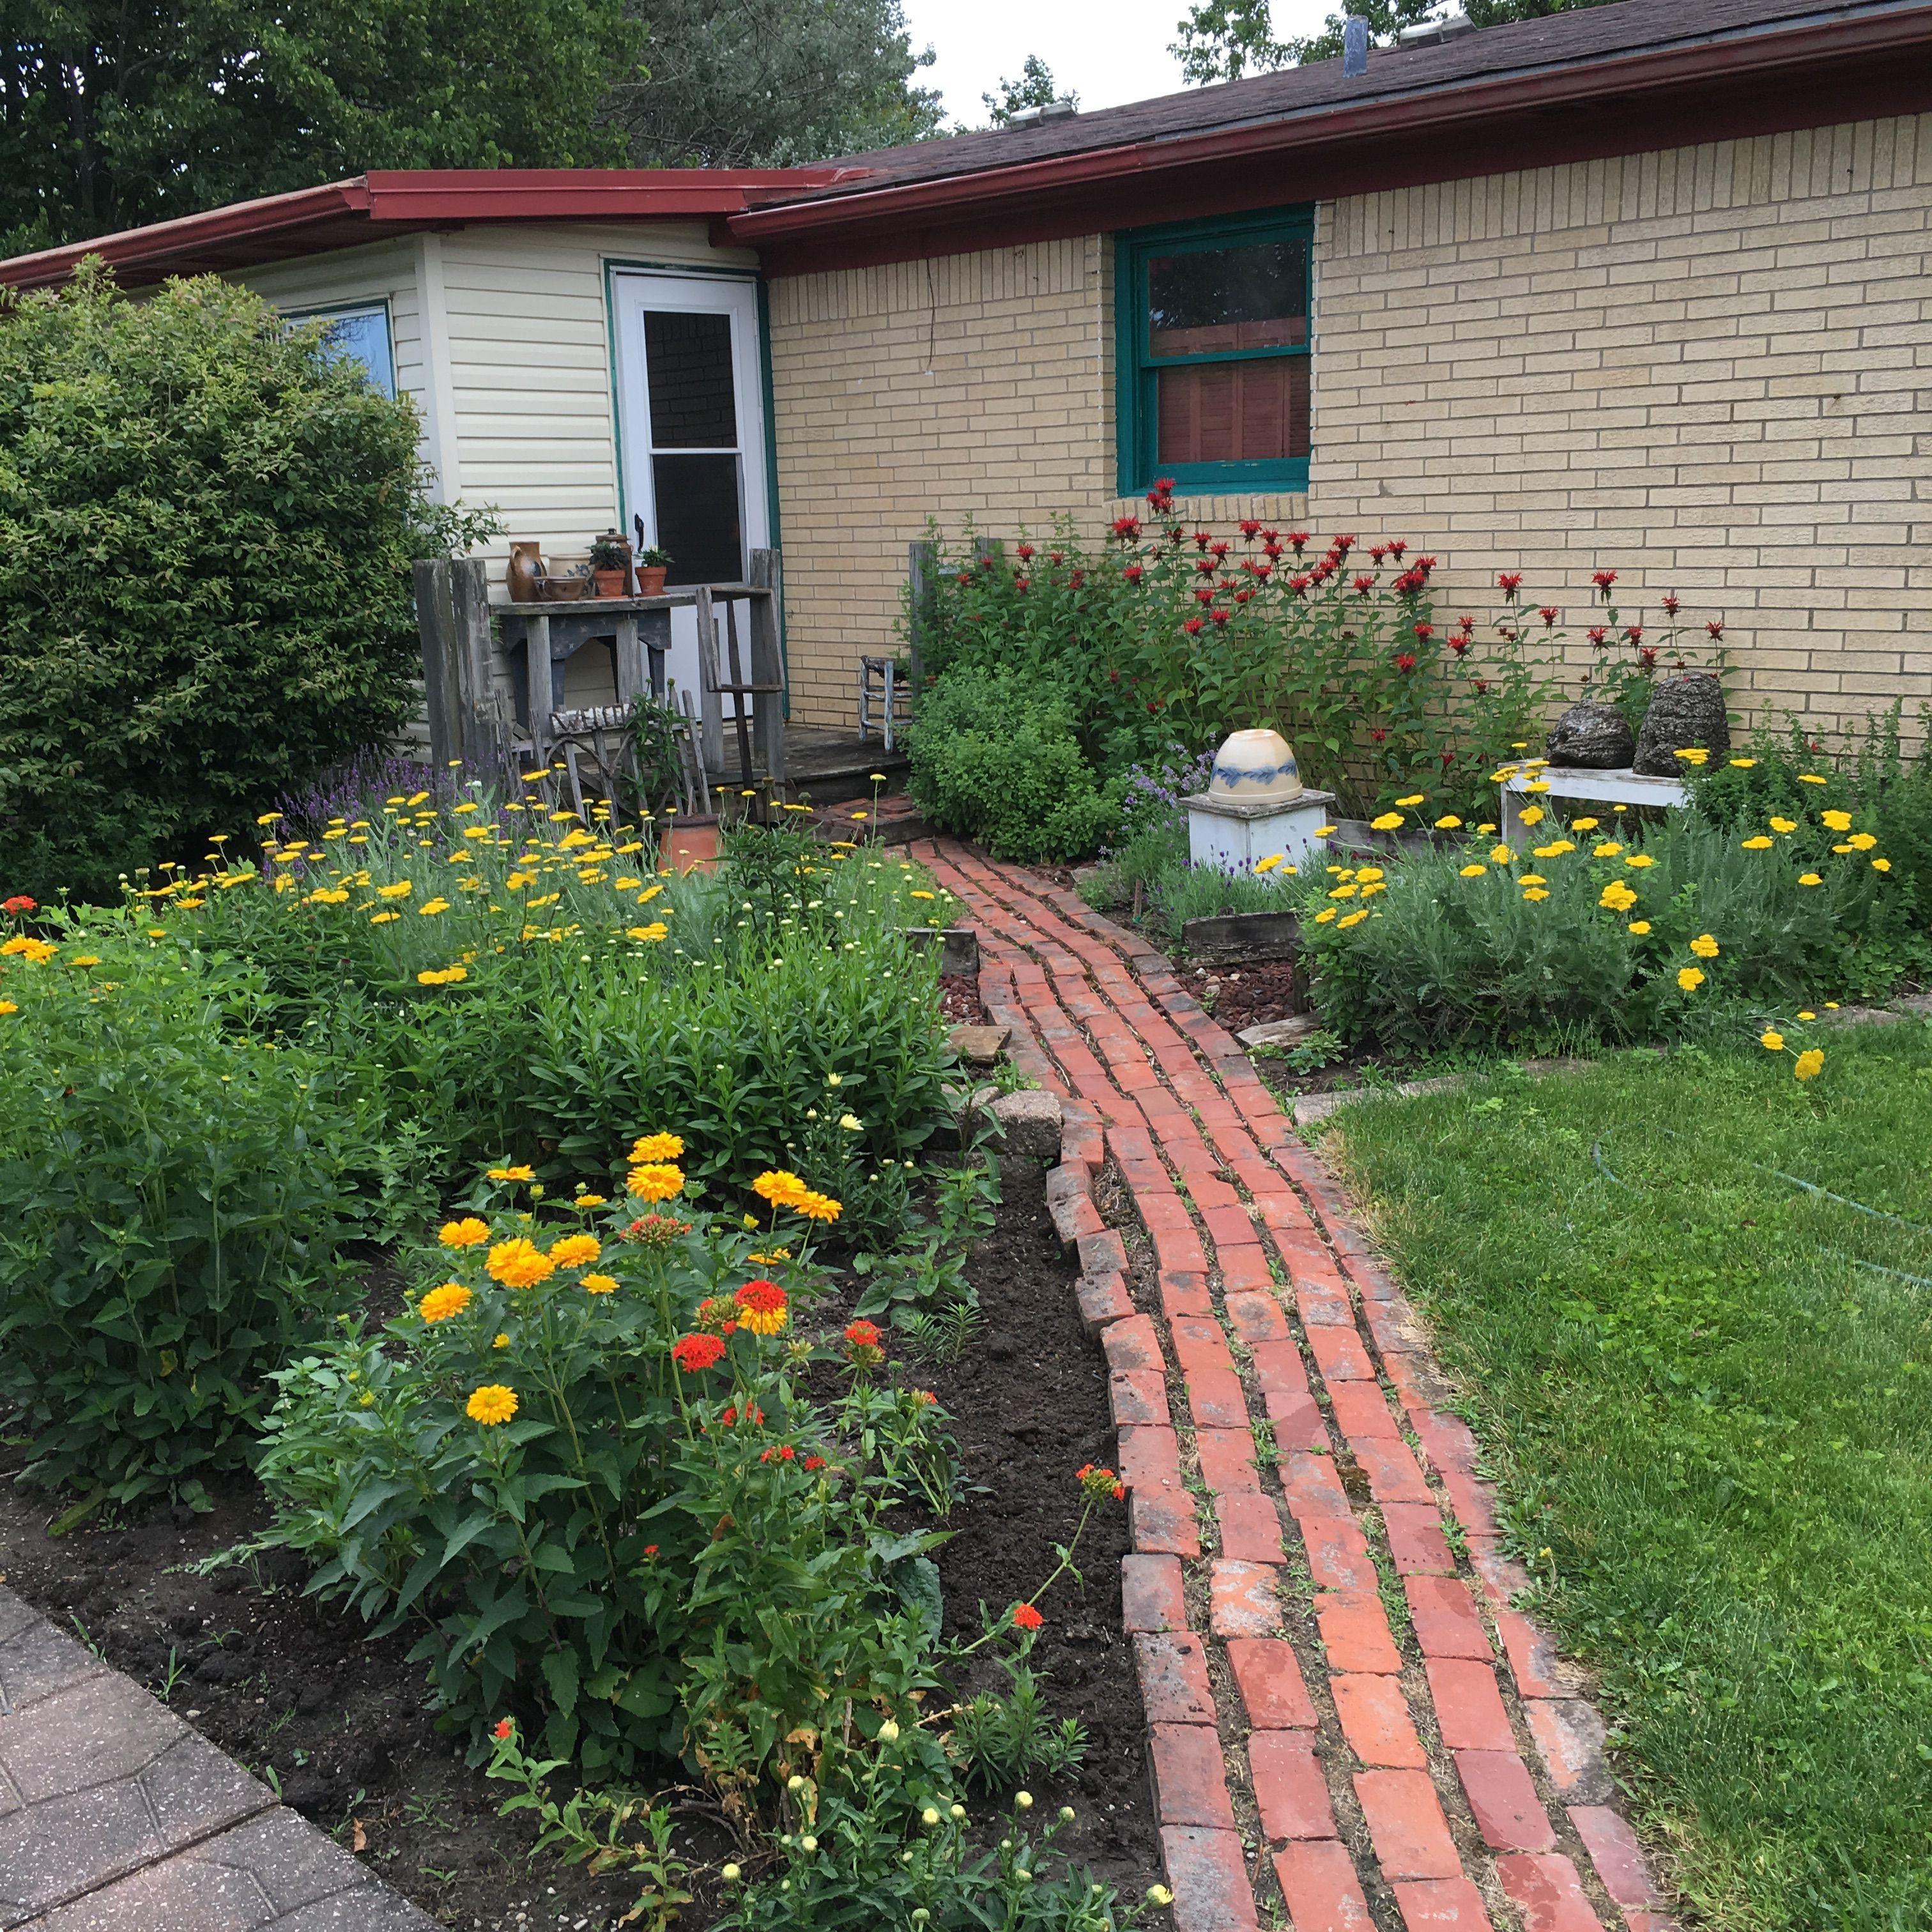 summer garden summer gardengarden shedsindianahomesteadprimitiveporches - Garden Sheds Indiana